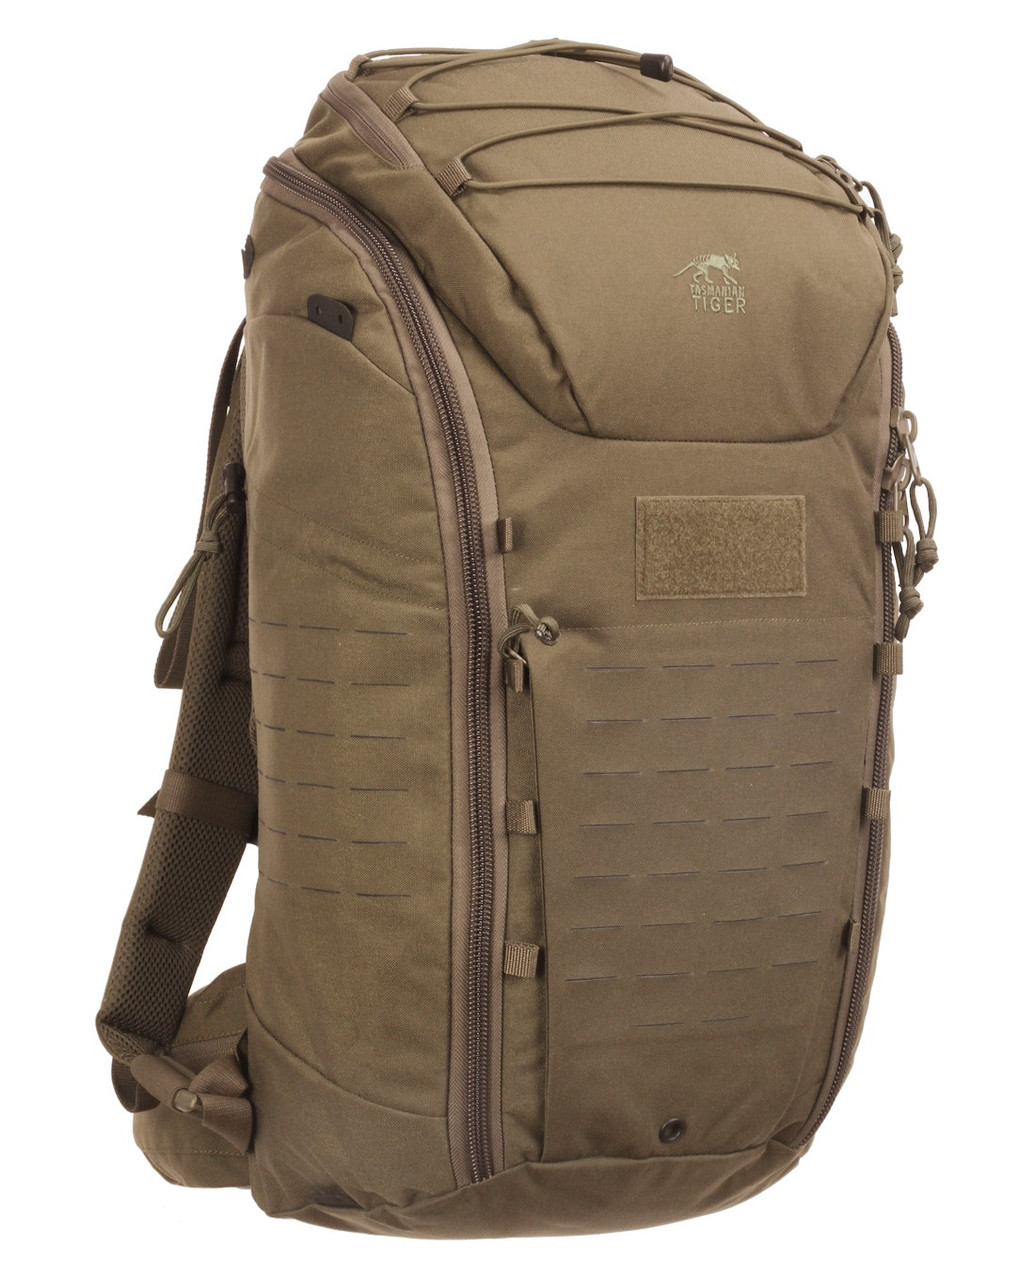 Тактичний рюкзак Tasmanian Tiger Modular Pack 30 Coyote Brown